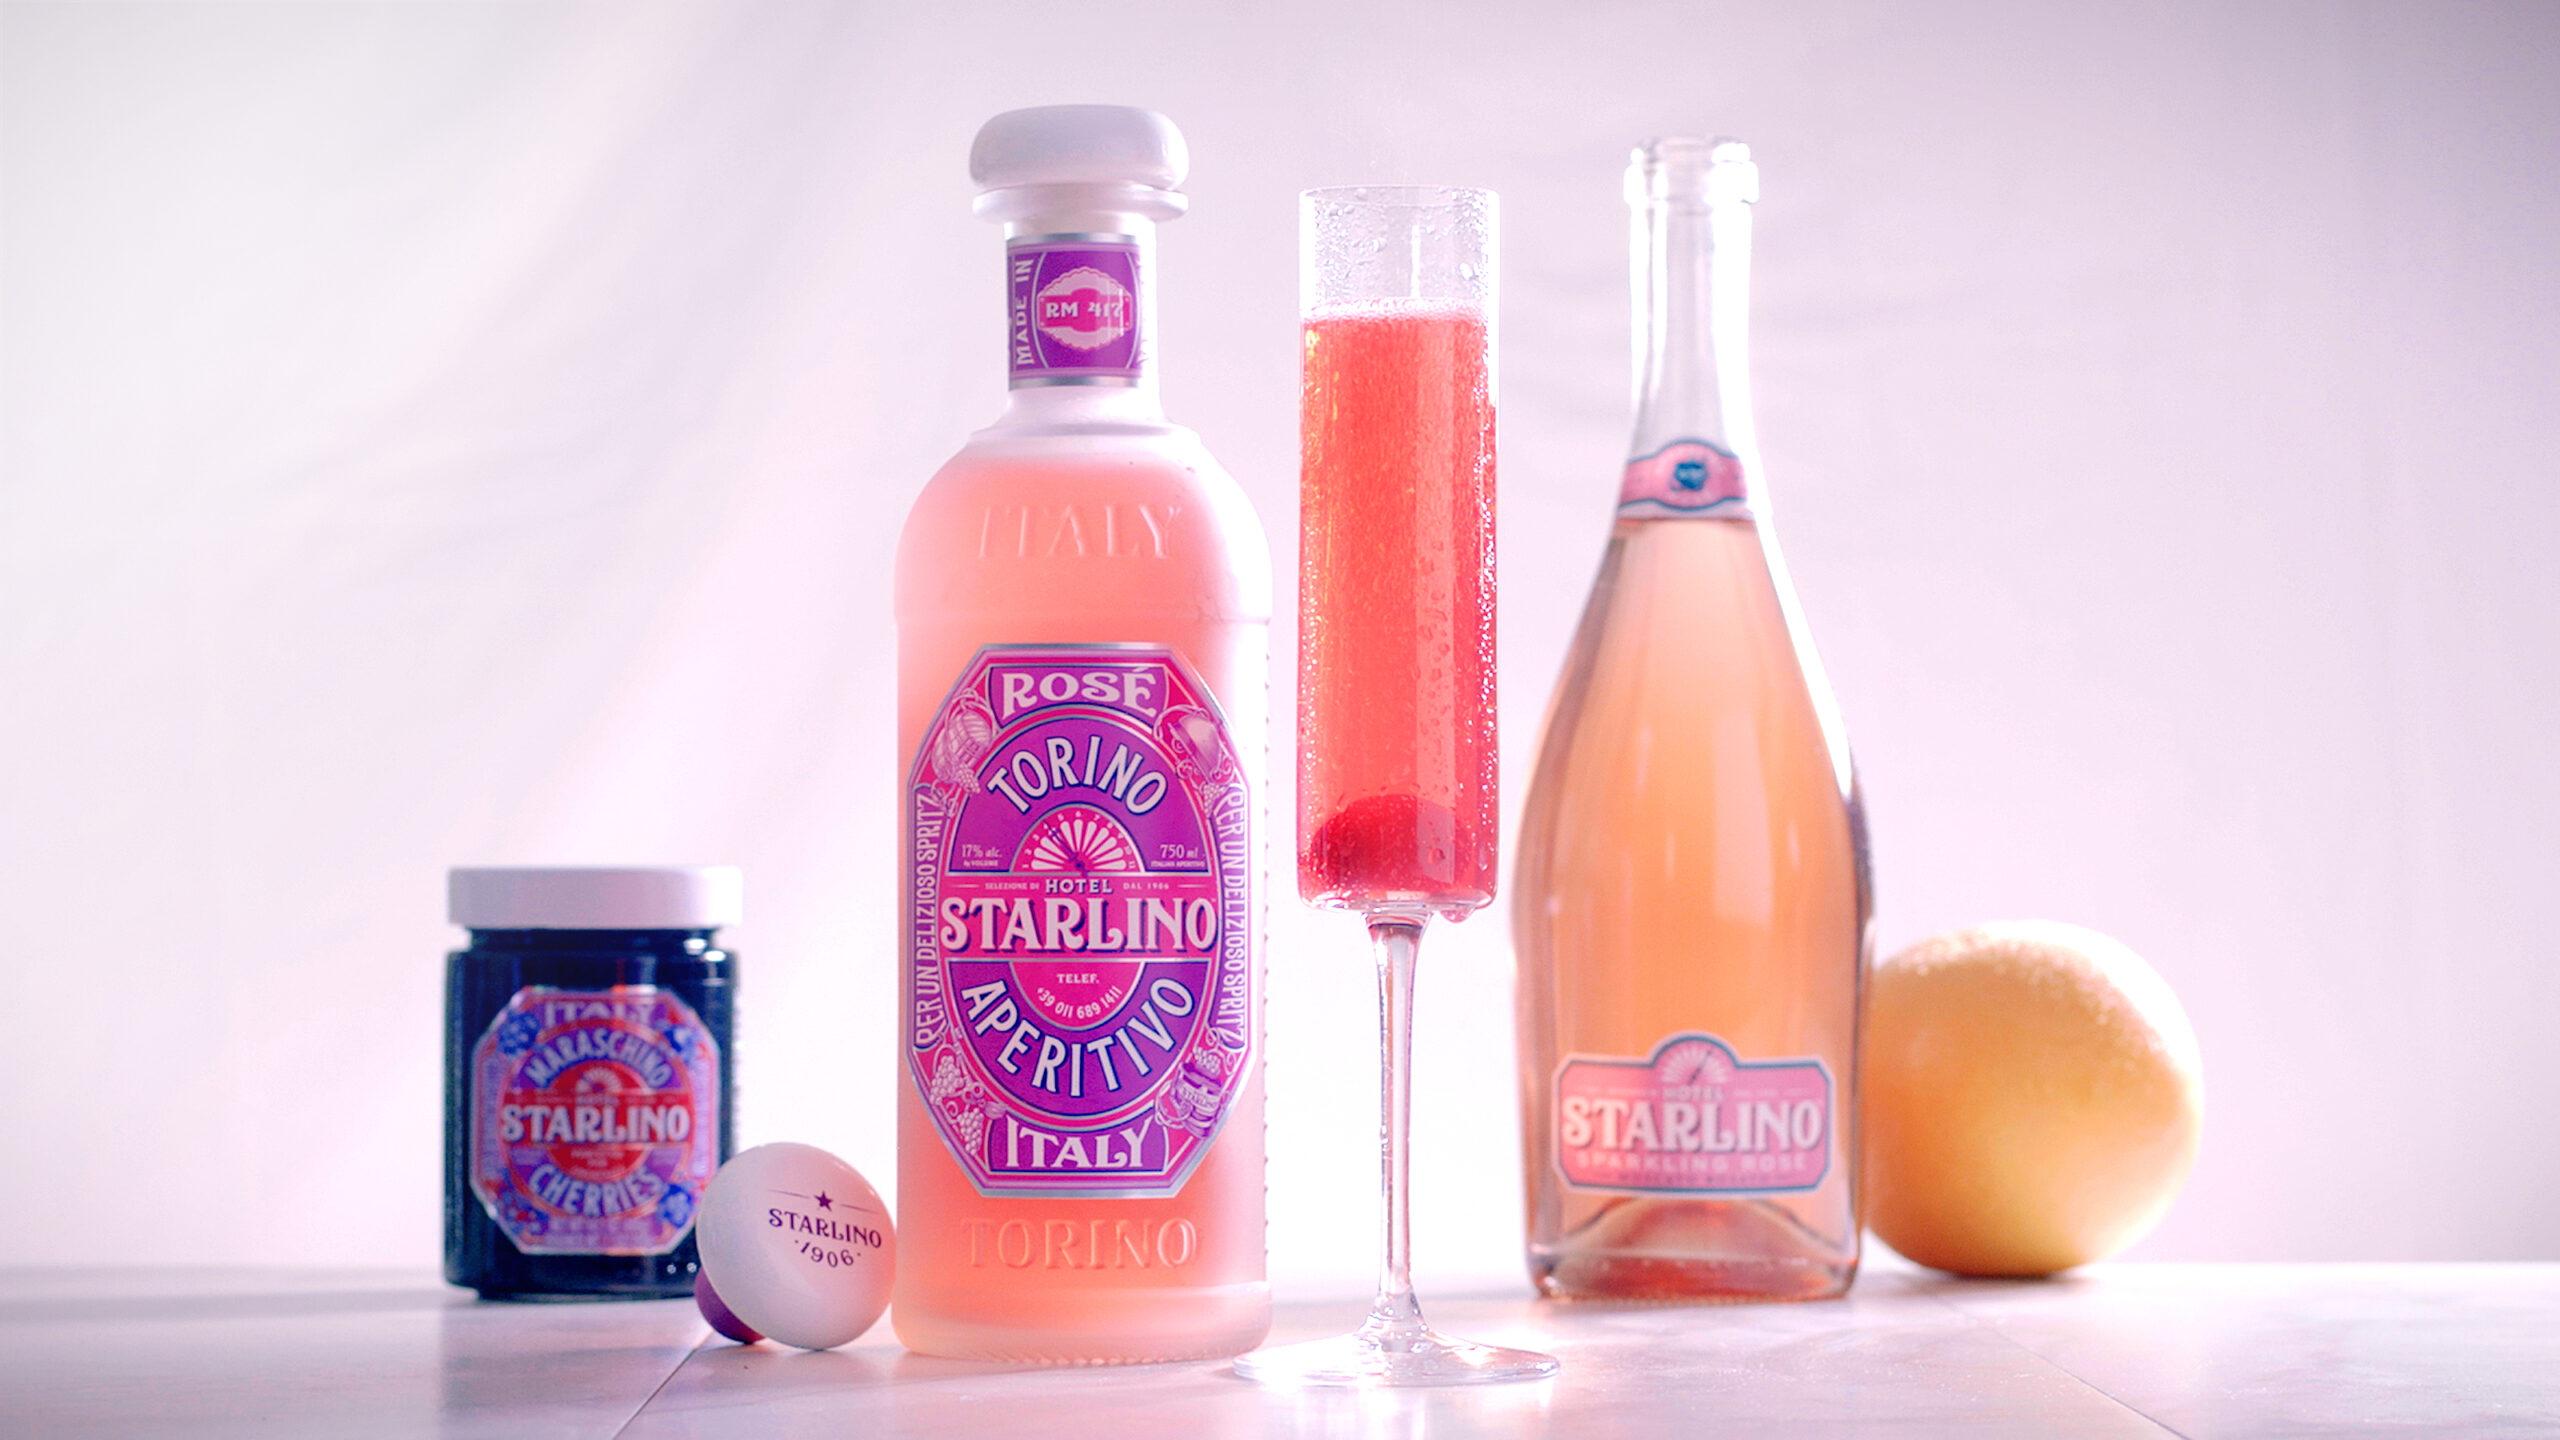 Stalino Italian Sparkling Rosé, from £17.98